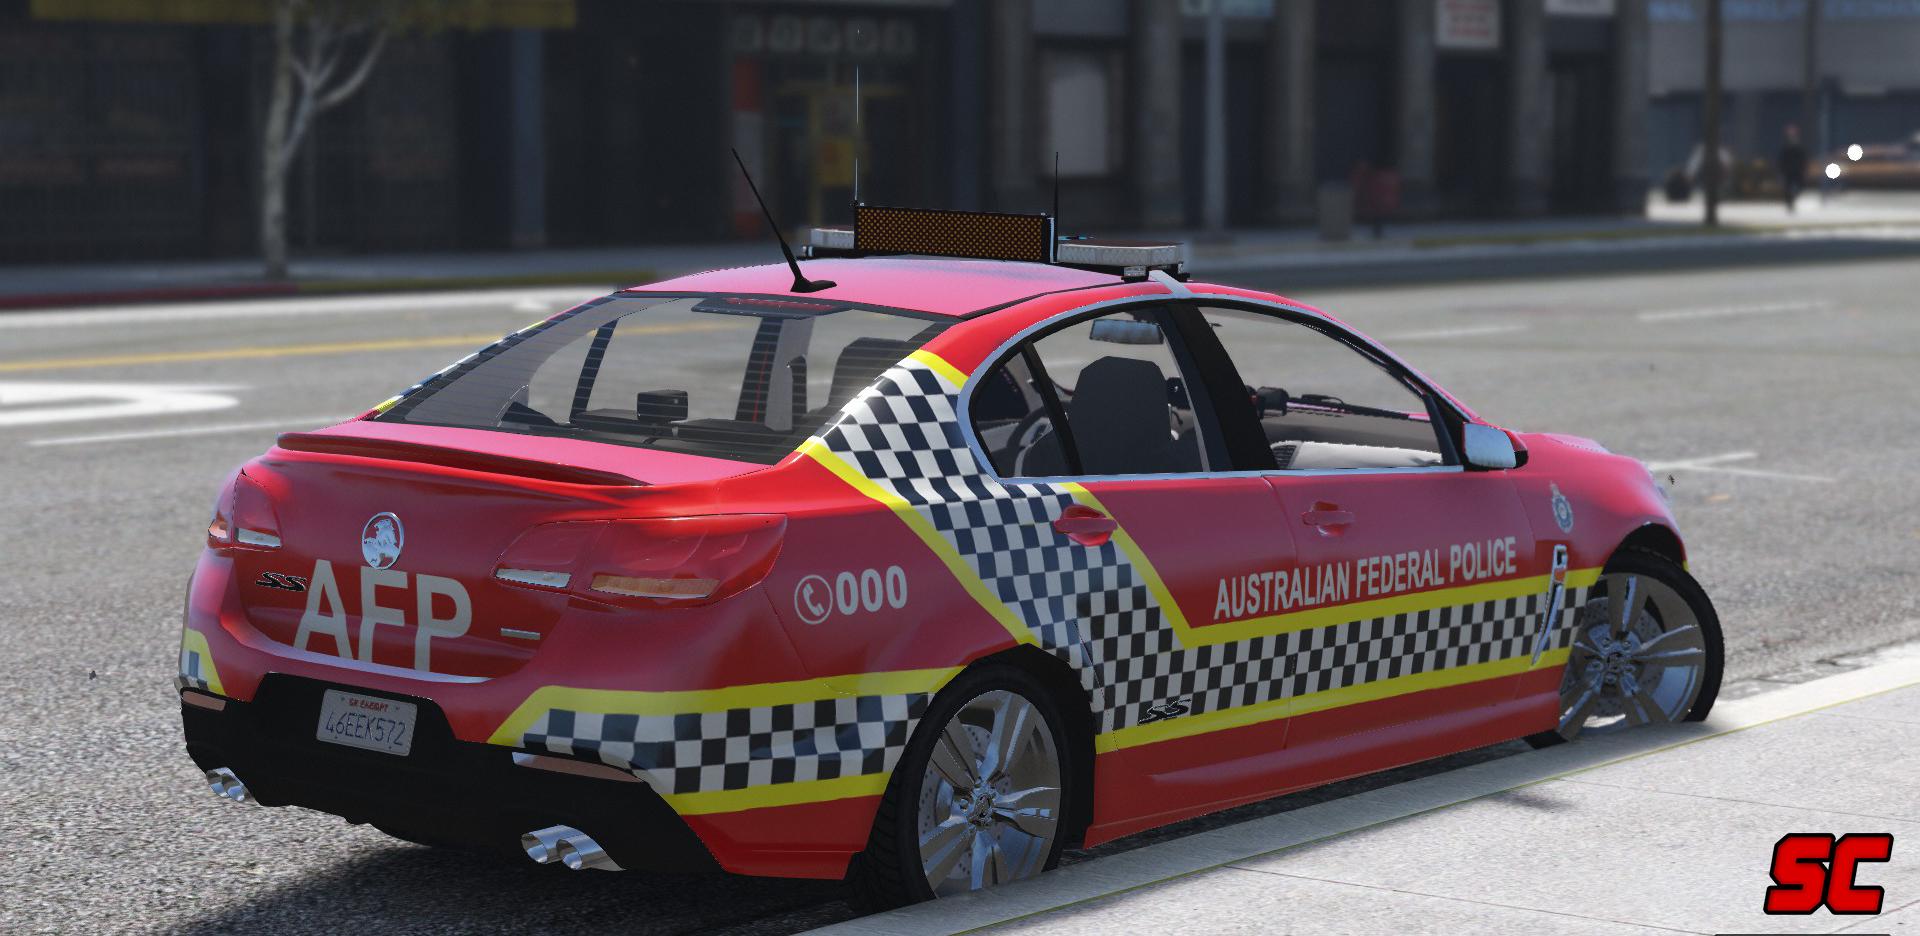 Afp Protective Services Car